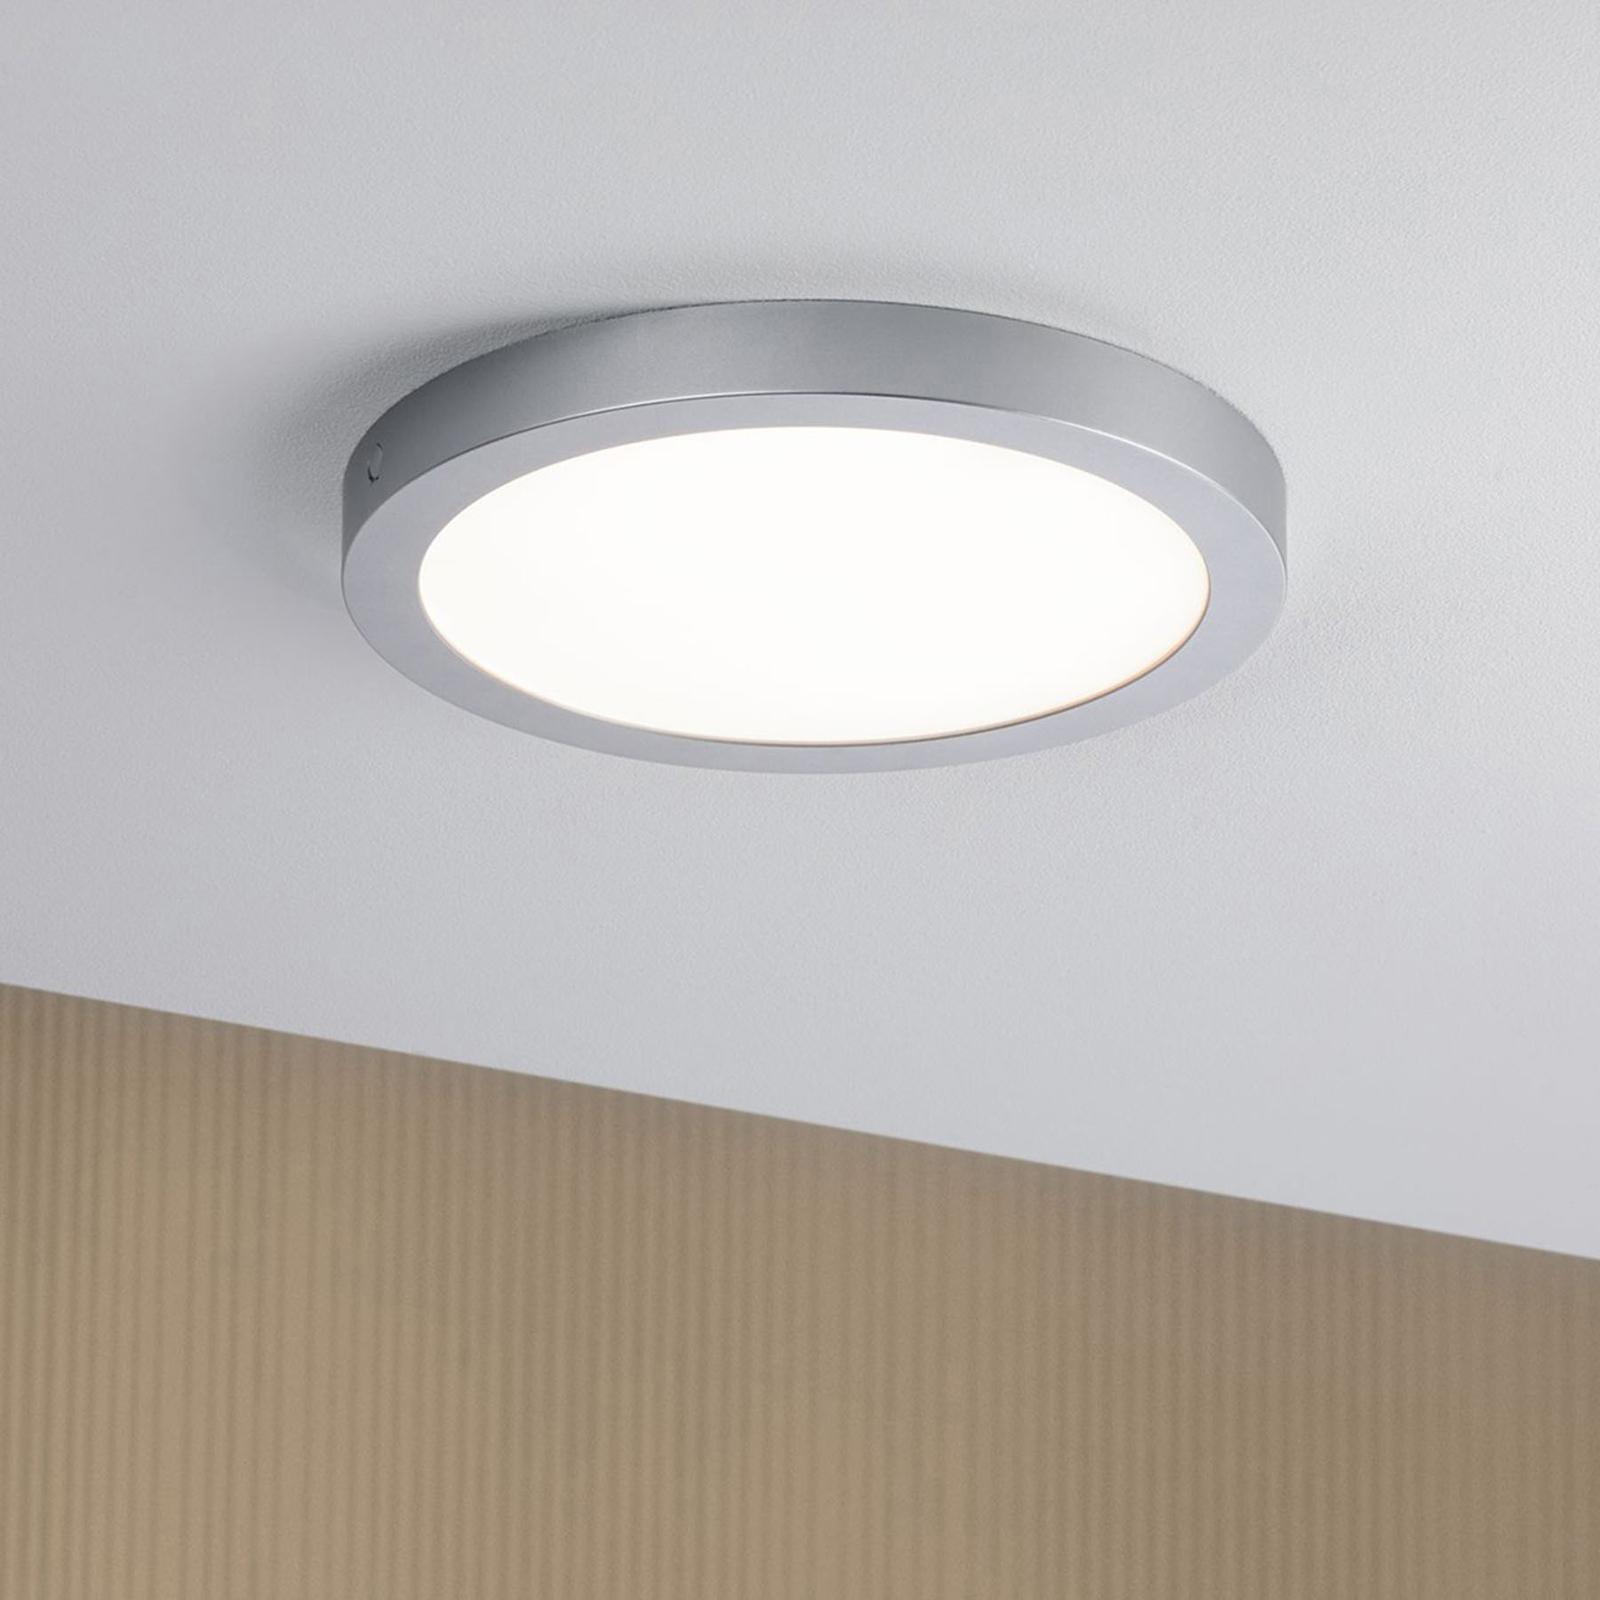 Paulmann Abia plafoniera LED Ø 30 cm cromo Illuminazione per interni